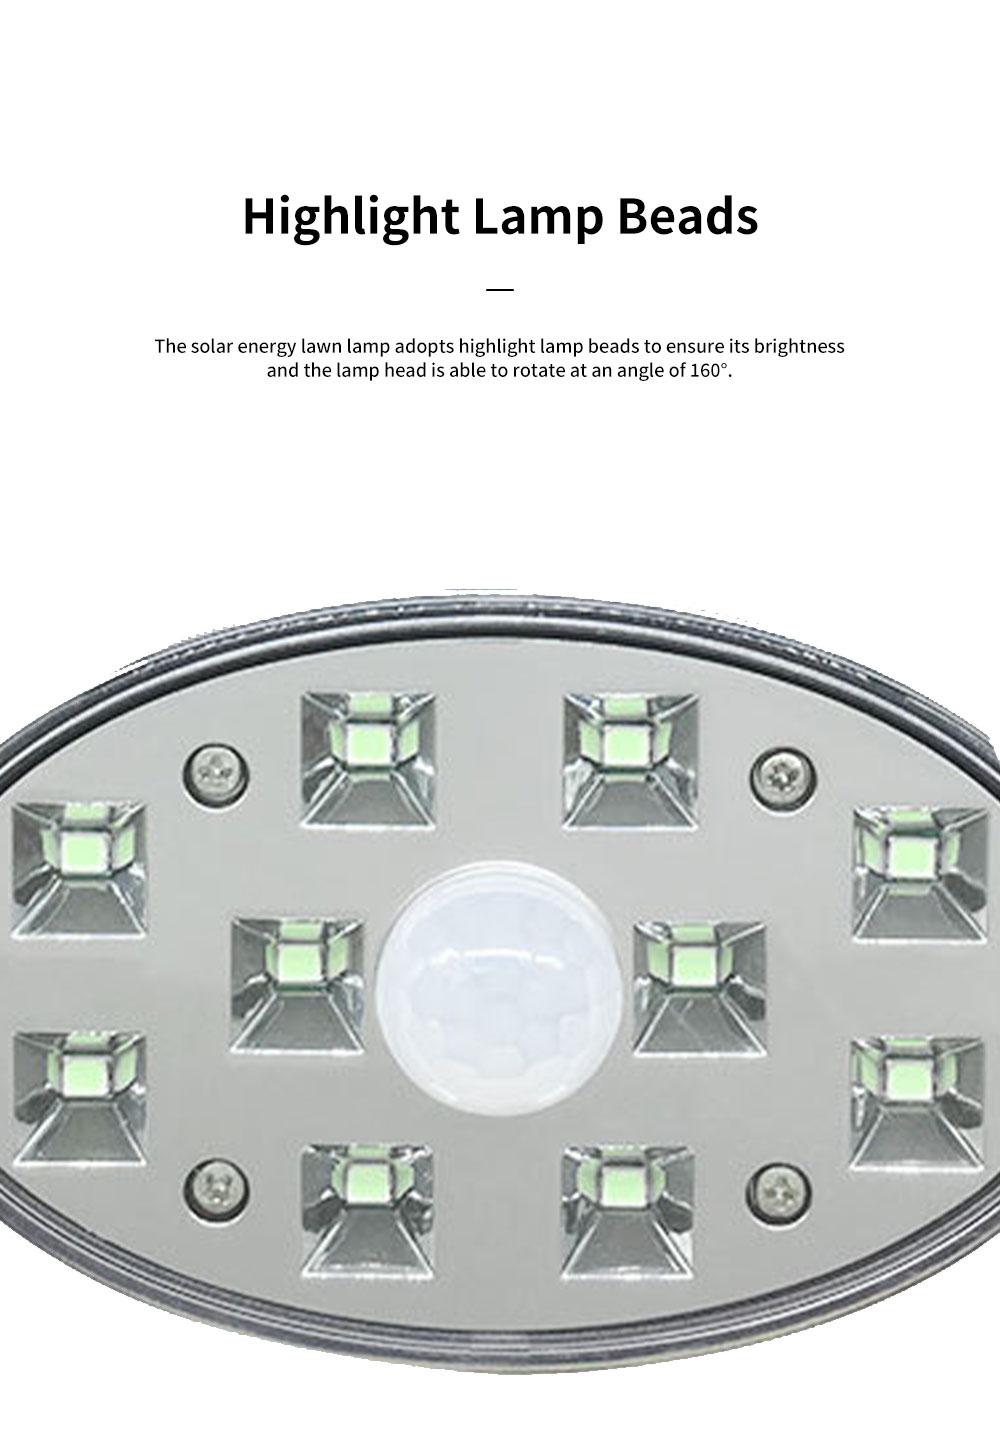 Solar Energy Ultra Thin Wall Lamp for Lawn Lighting Decoration Body Sensing Flat Panel Lawn Light Ultrathin Waterproof Lawn Lamp 4